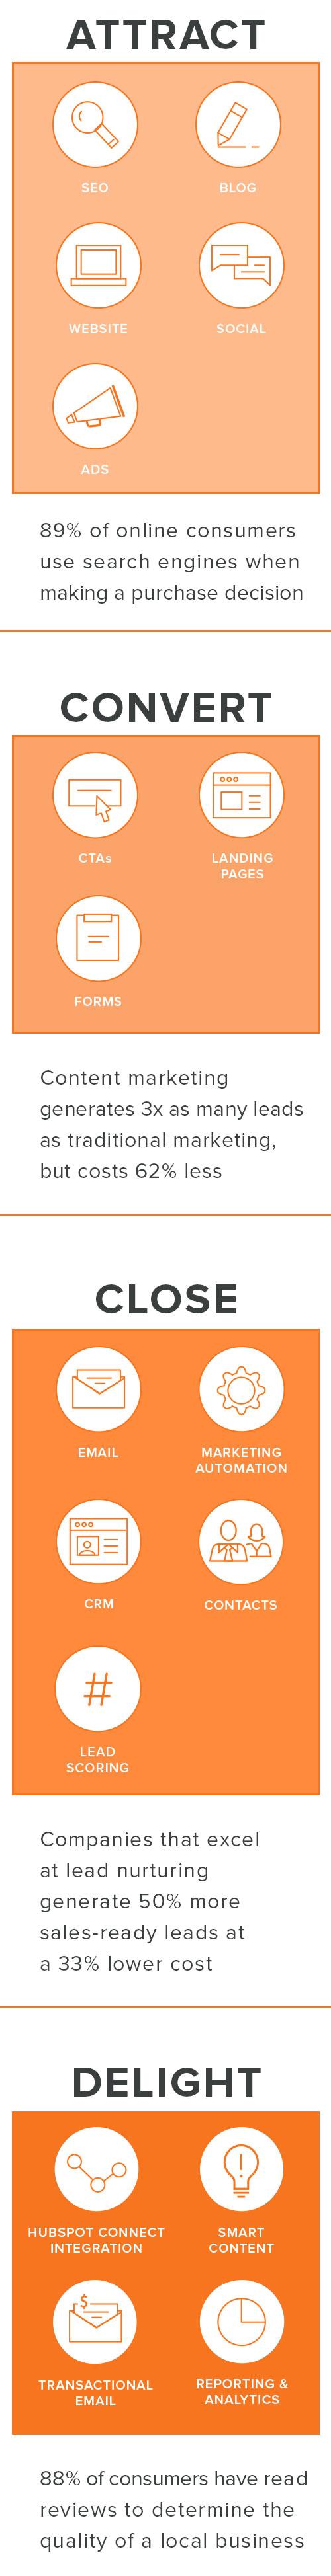 Sales_Walk_Through_Funnel_Graphic_MOBILE_HubSpot_Tools.jpg